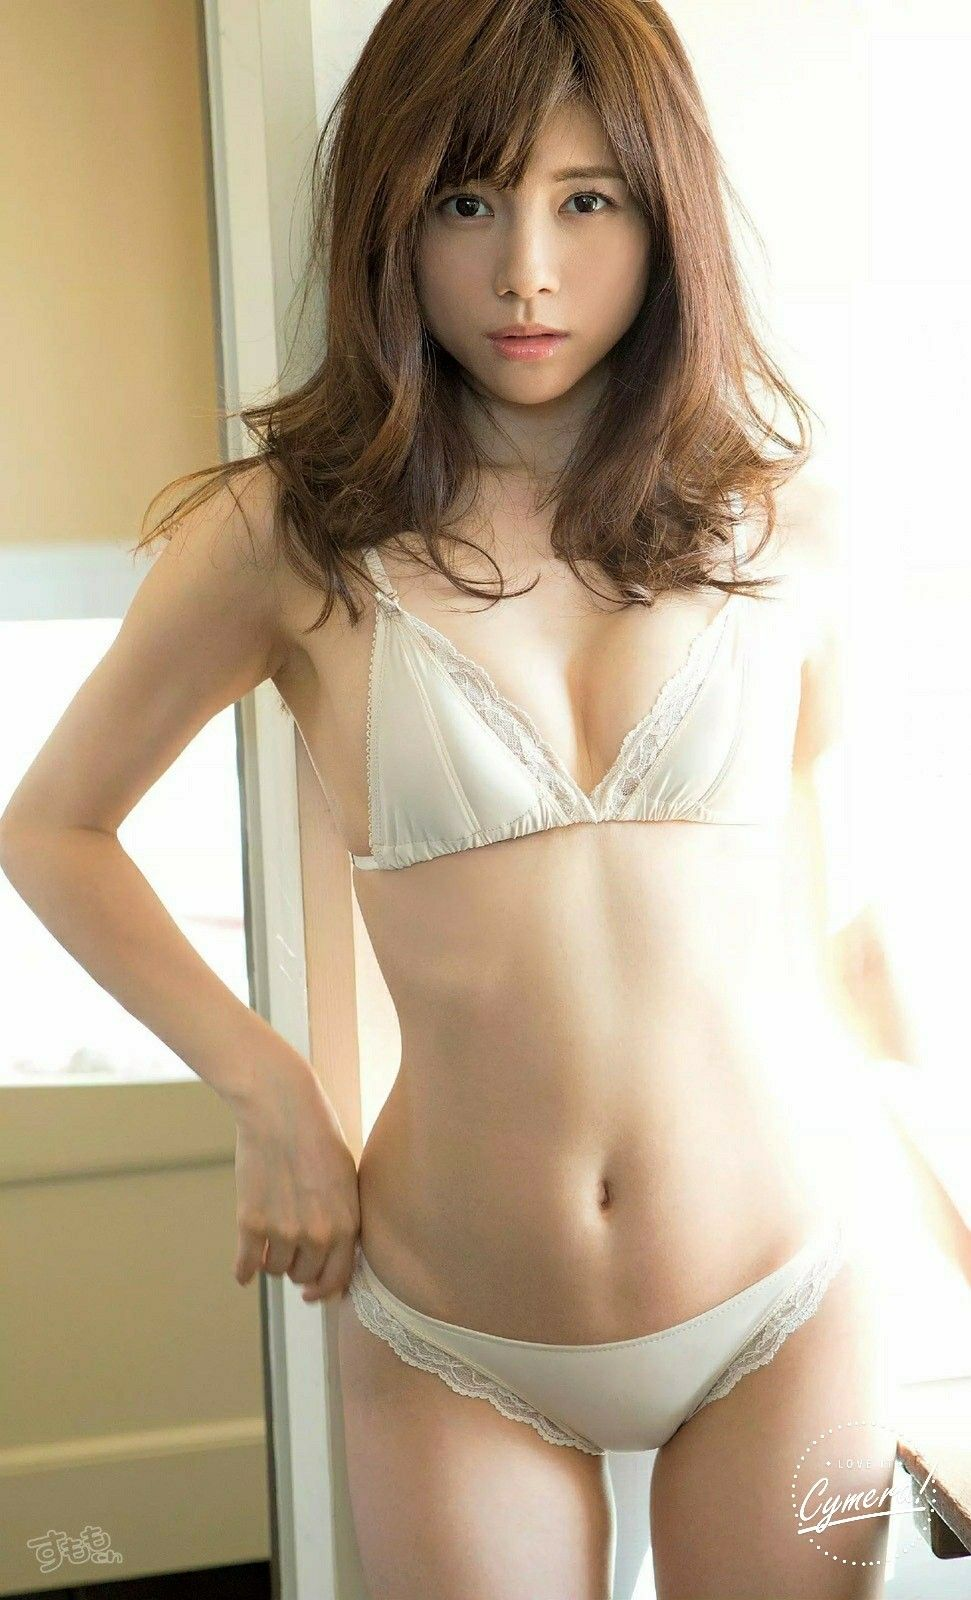 Asian guys in girls panties, emmanuel porn movie